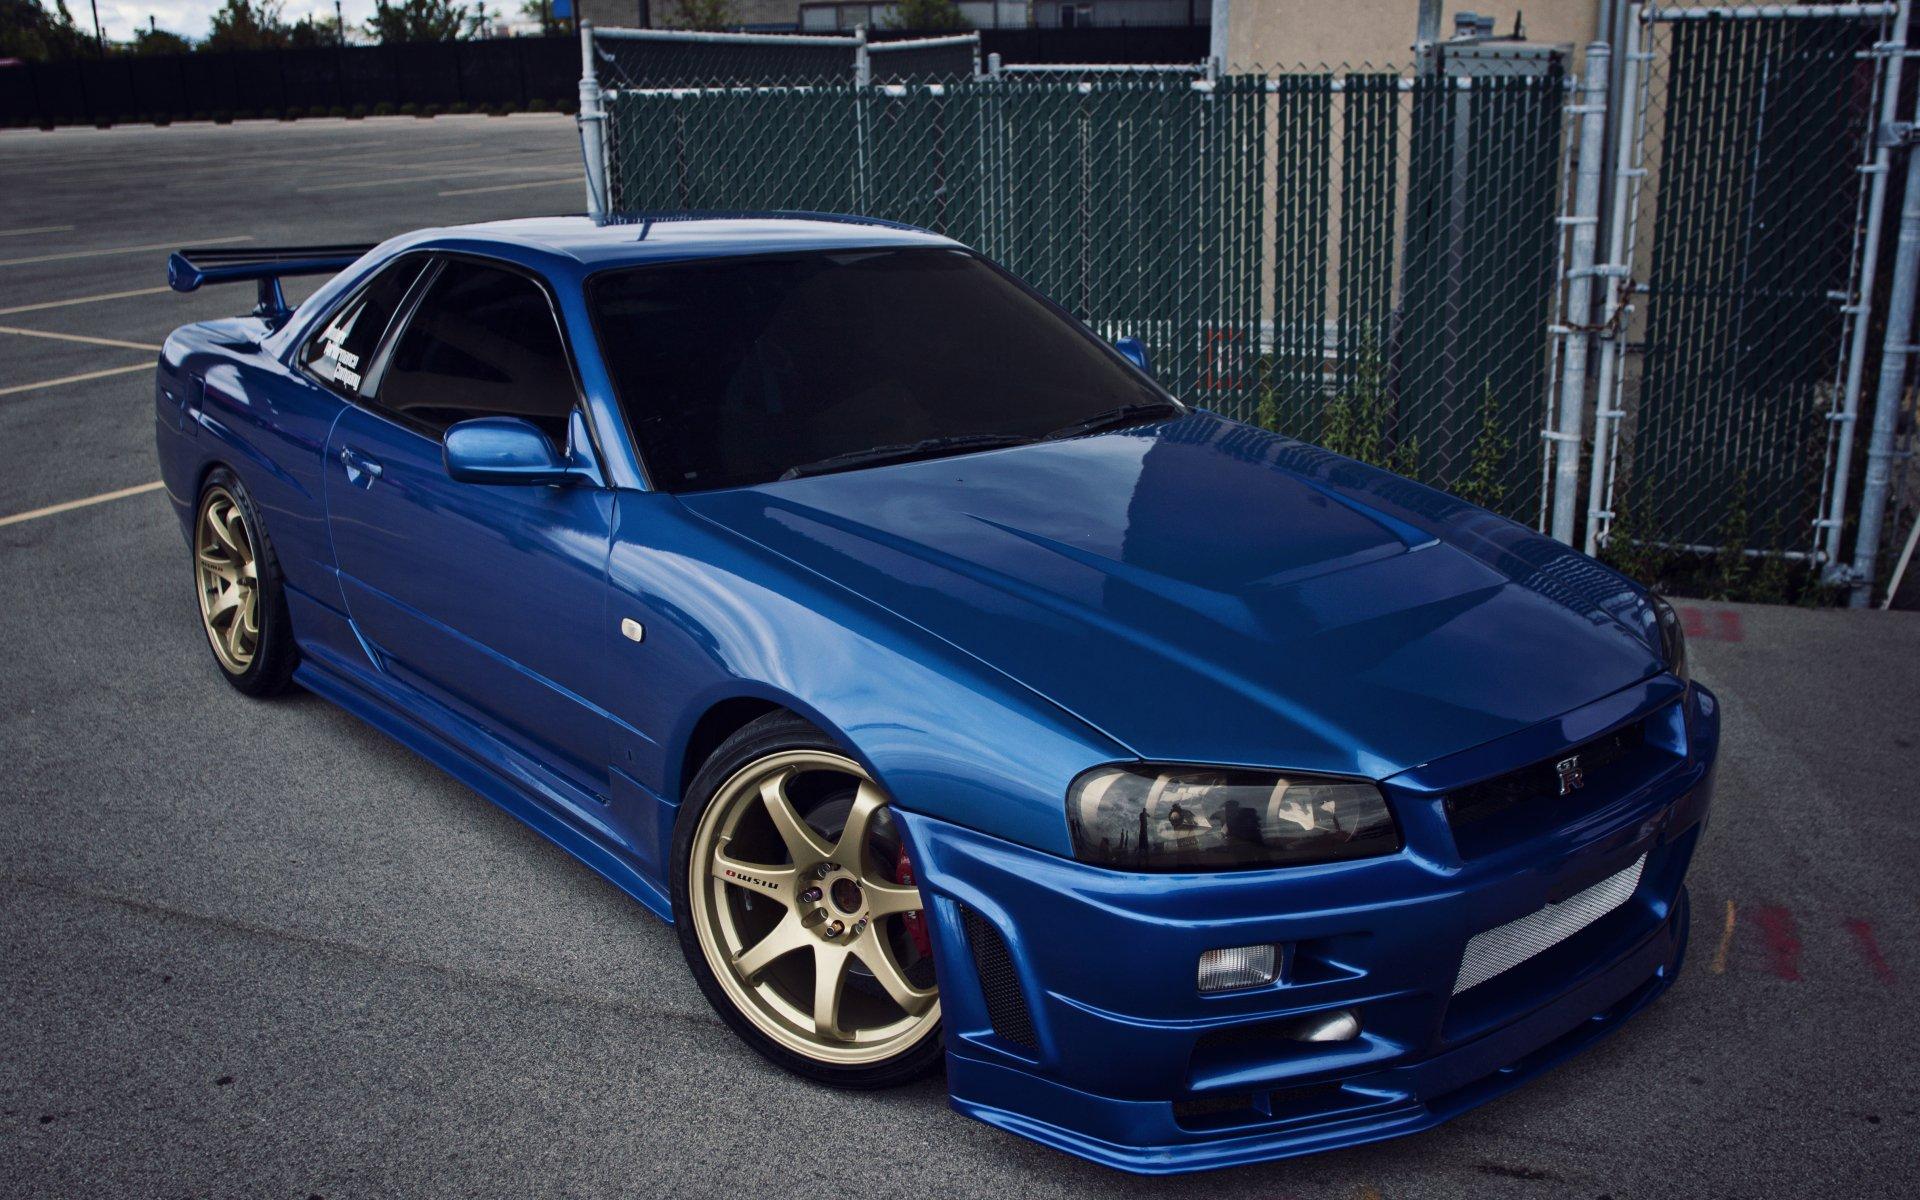 Nissan Skyline 4k Ultra HD Wallpaper   Background Image ...